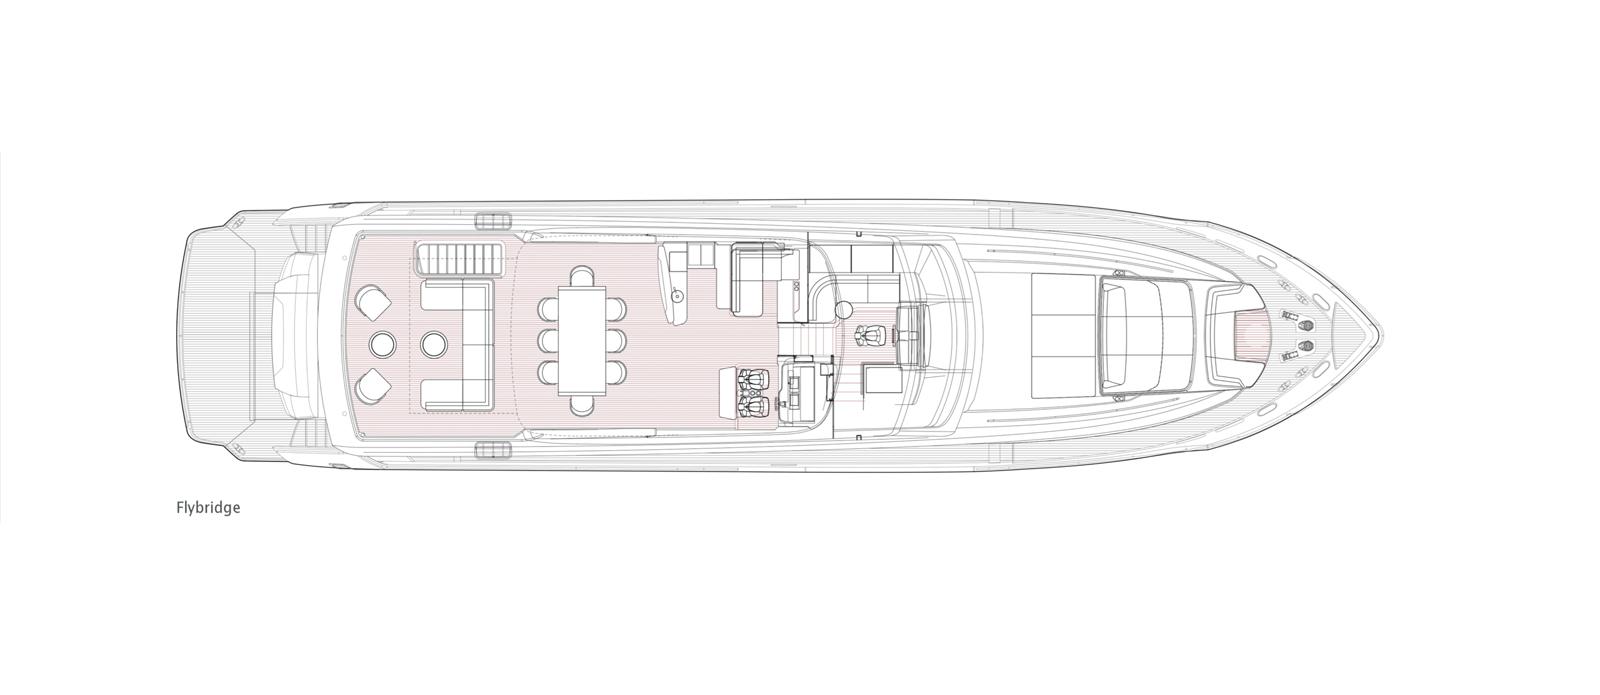 Princess 30 Metre Yacht Bandazul - Flybridge GA